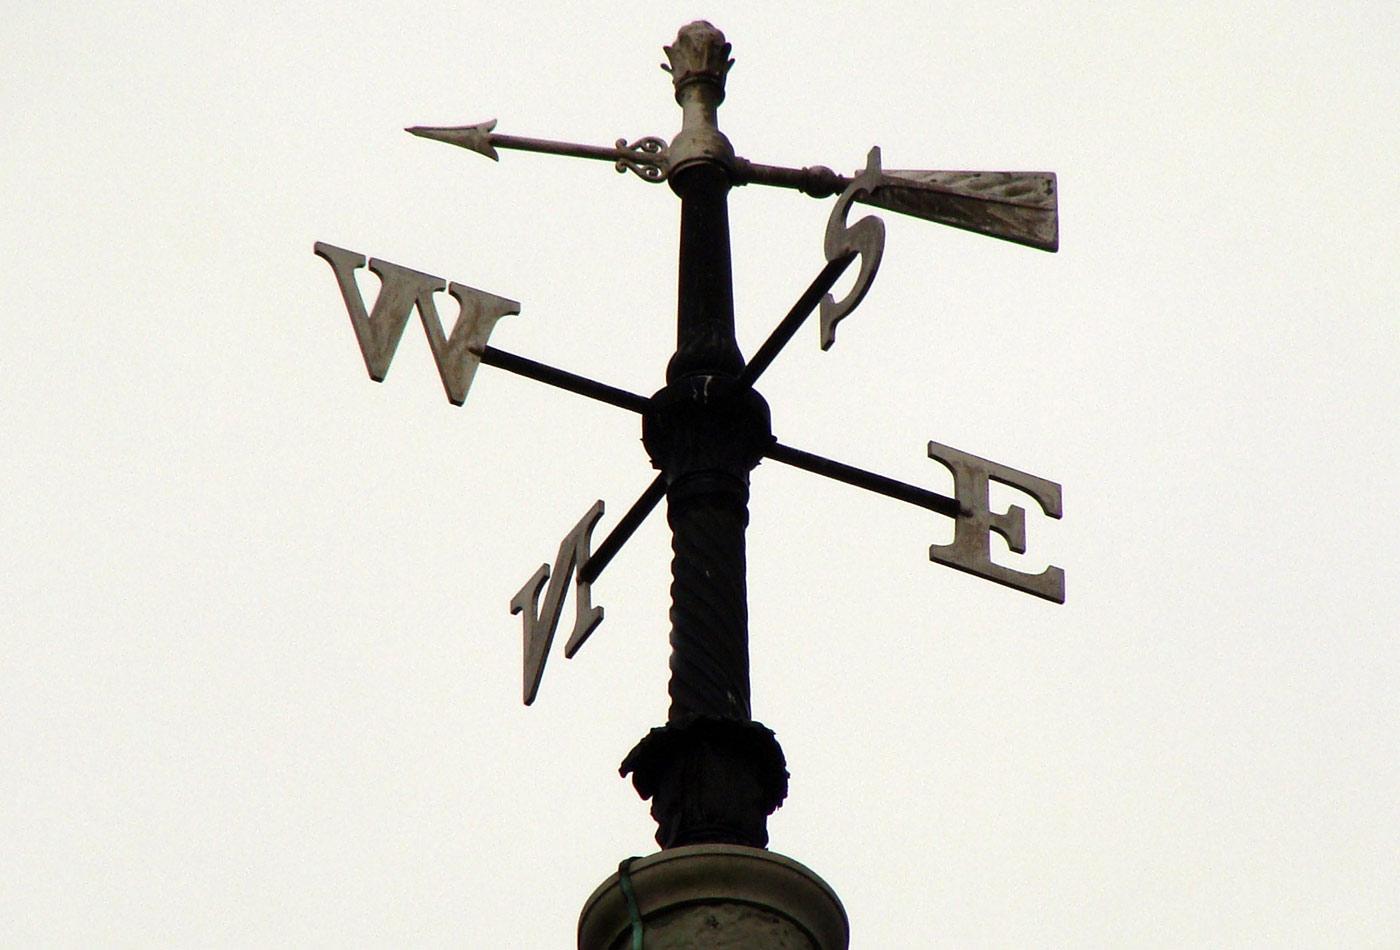 18th century wrought iron weathervane on Holy Trinity Church, Marylebone Road, London